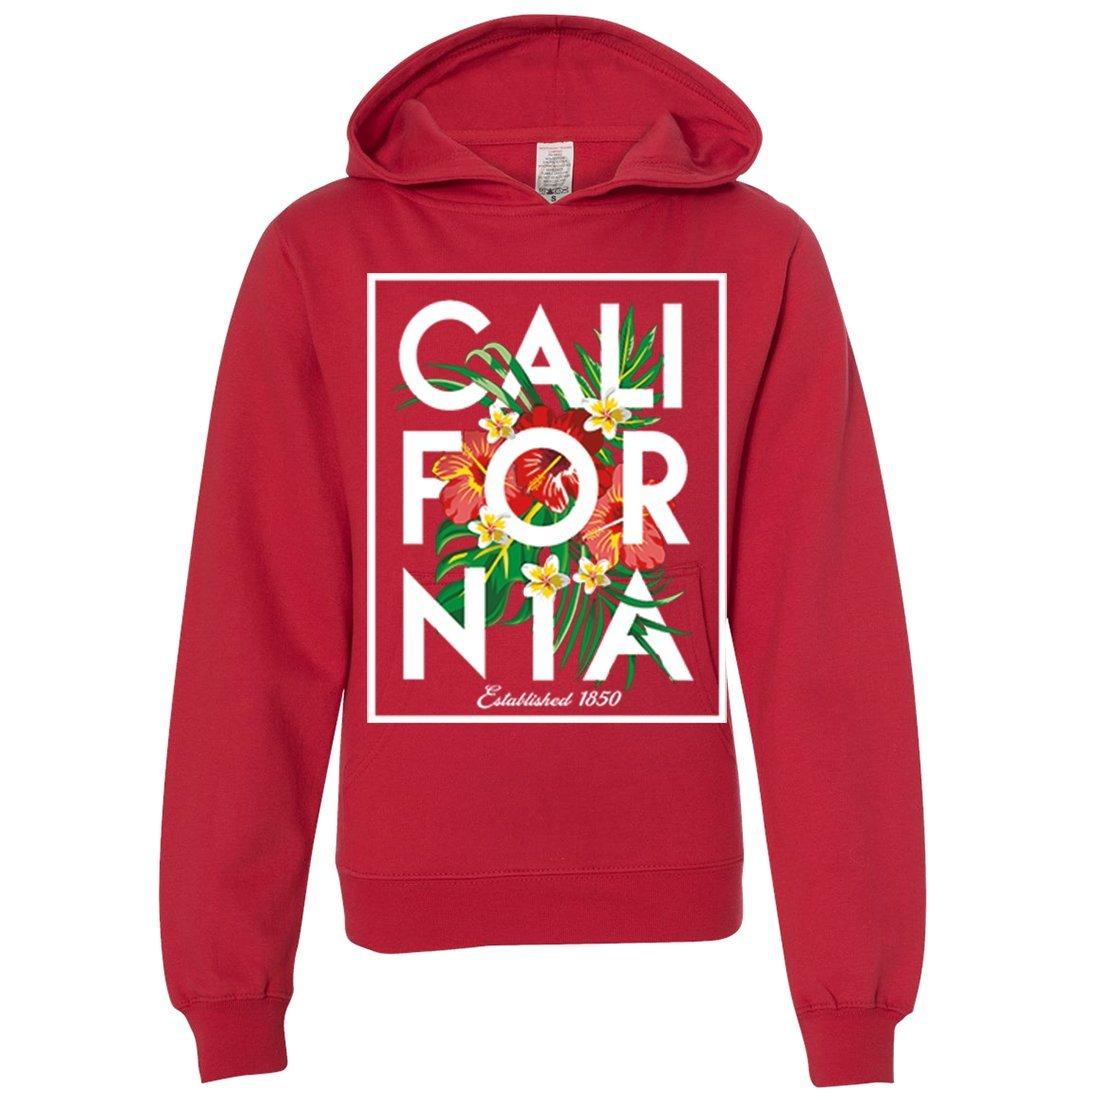 Cali Tropical Flowers White Print Premium Youth Sweatshirt Hoodie